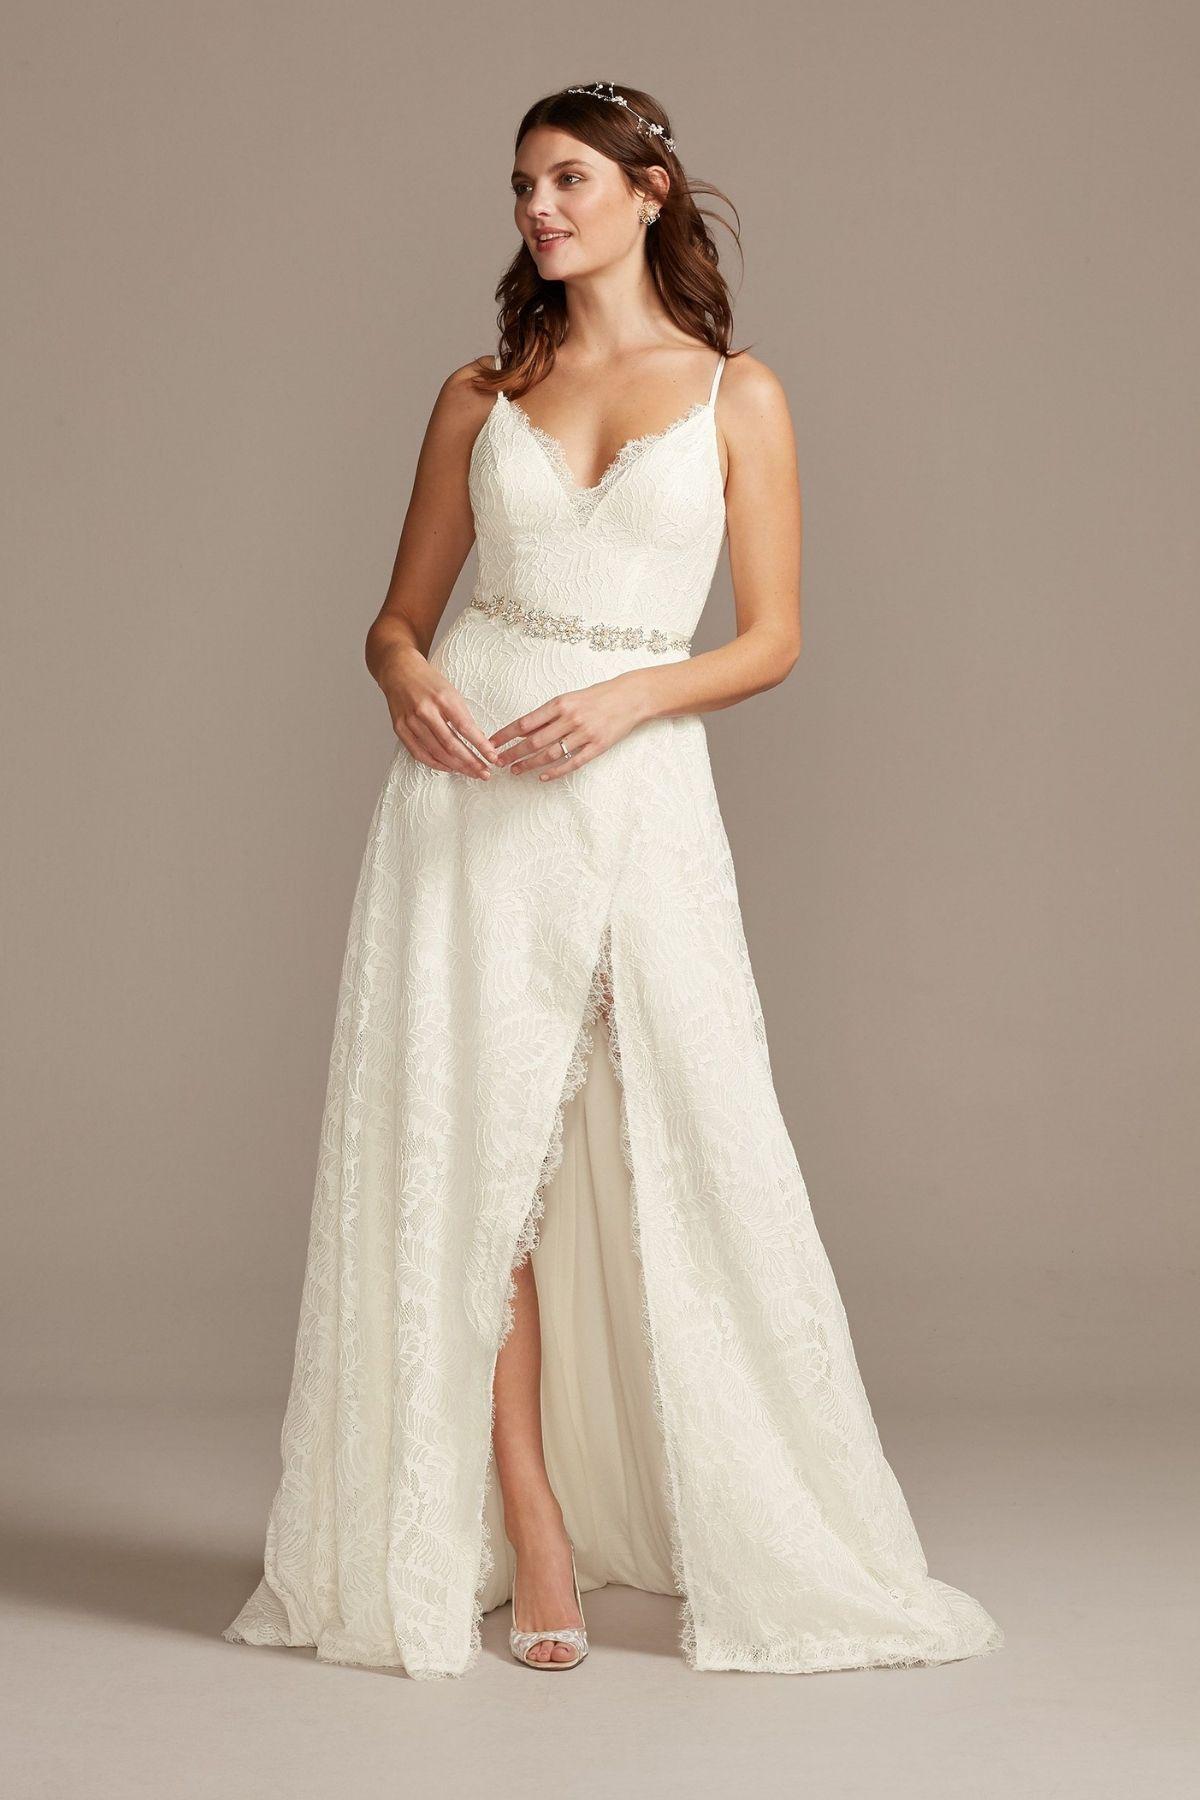 4. Leaf Pattern Lace Slit Skirt A-Line Wedding Dress